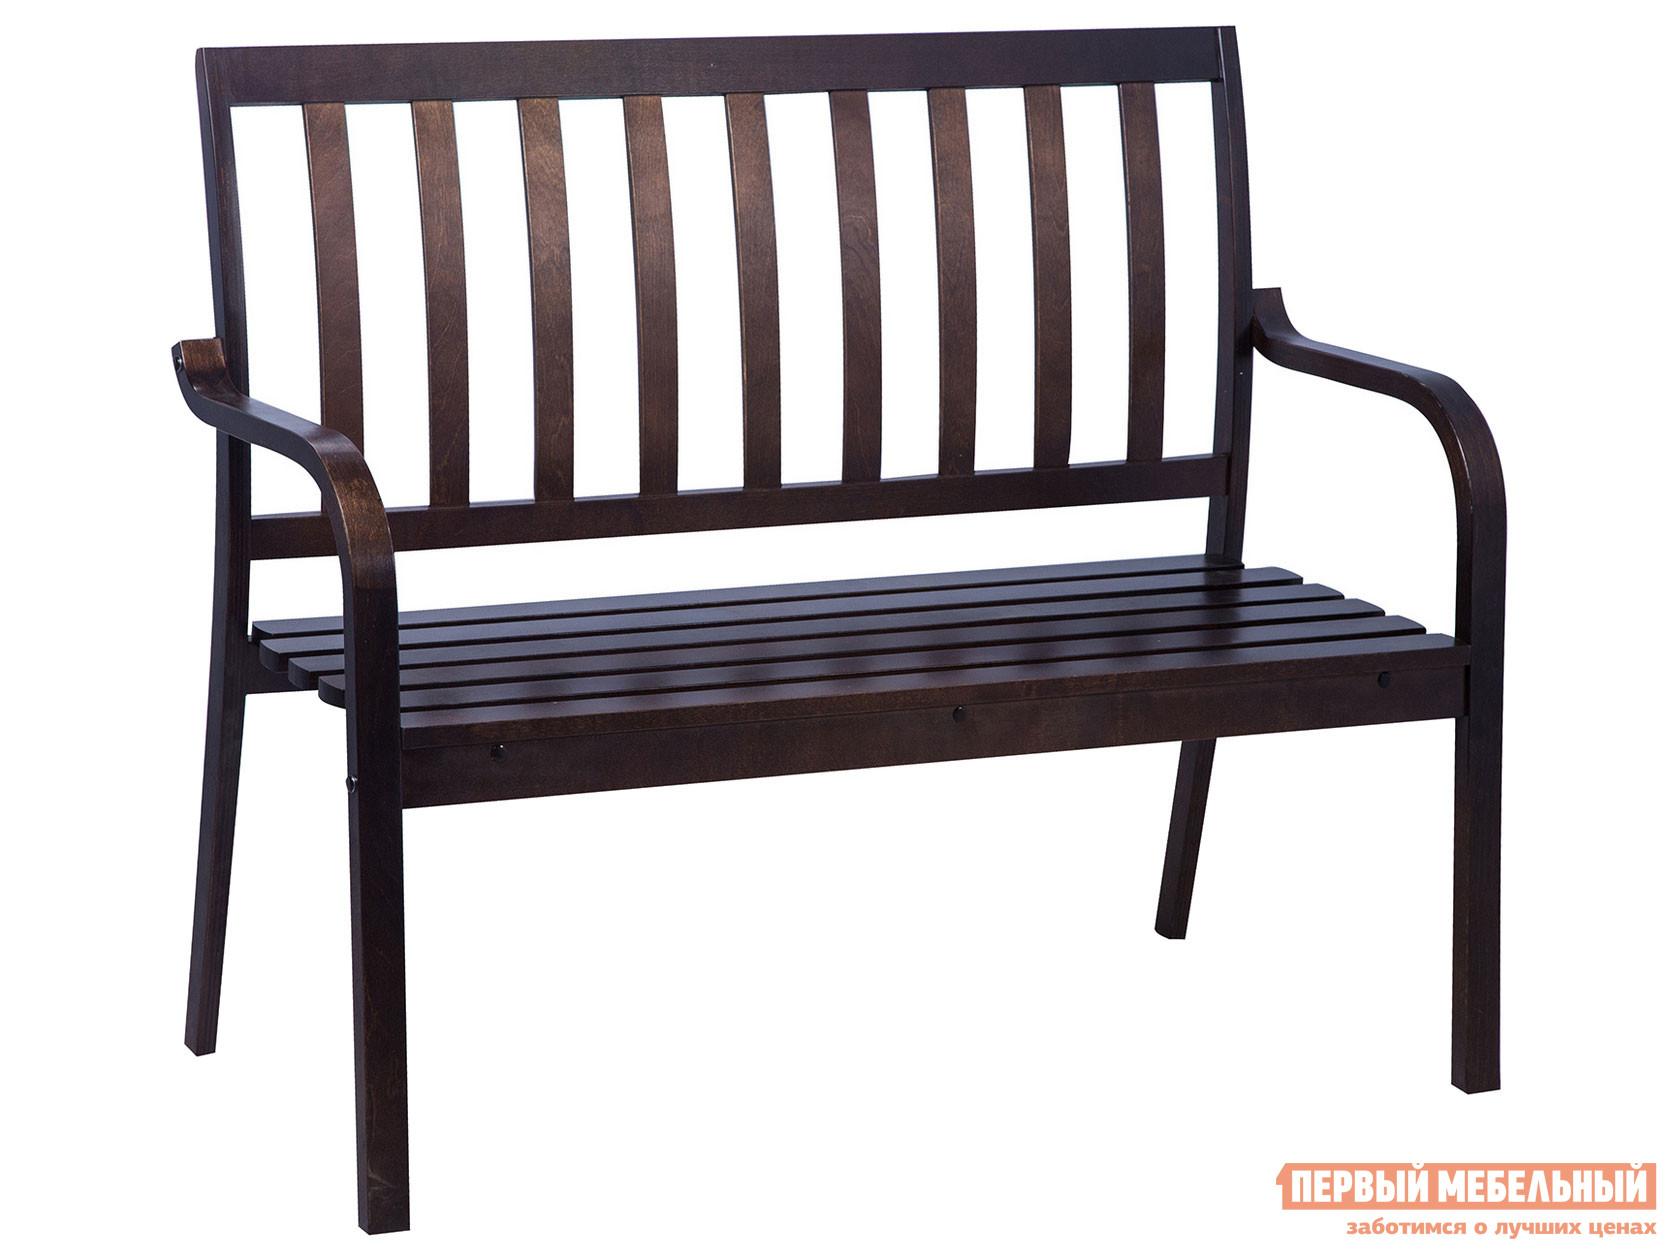 Садовый диван  Берн Дуб темный Mebwill 91729